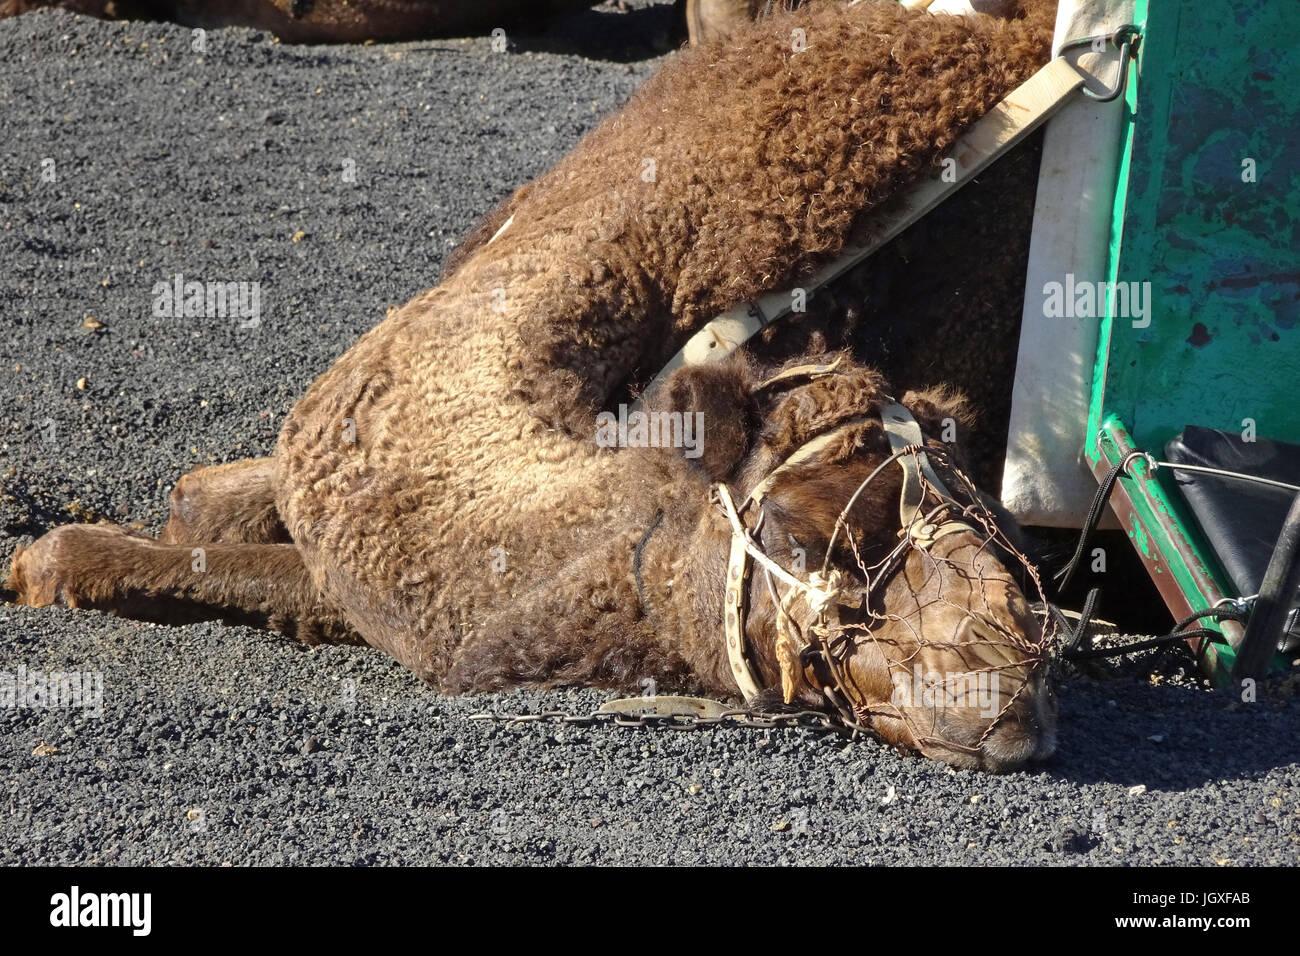 Doesendes Dromedar, einhoeckriges Kamel (Camelus dromedarius), Reitkamele fuer touristische Ausfluege im Nationalpark - Stock Image